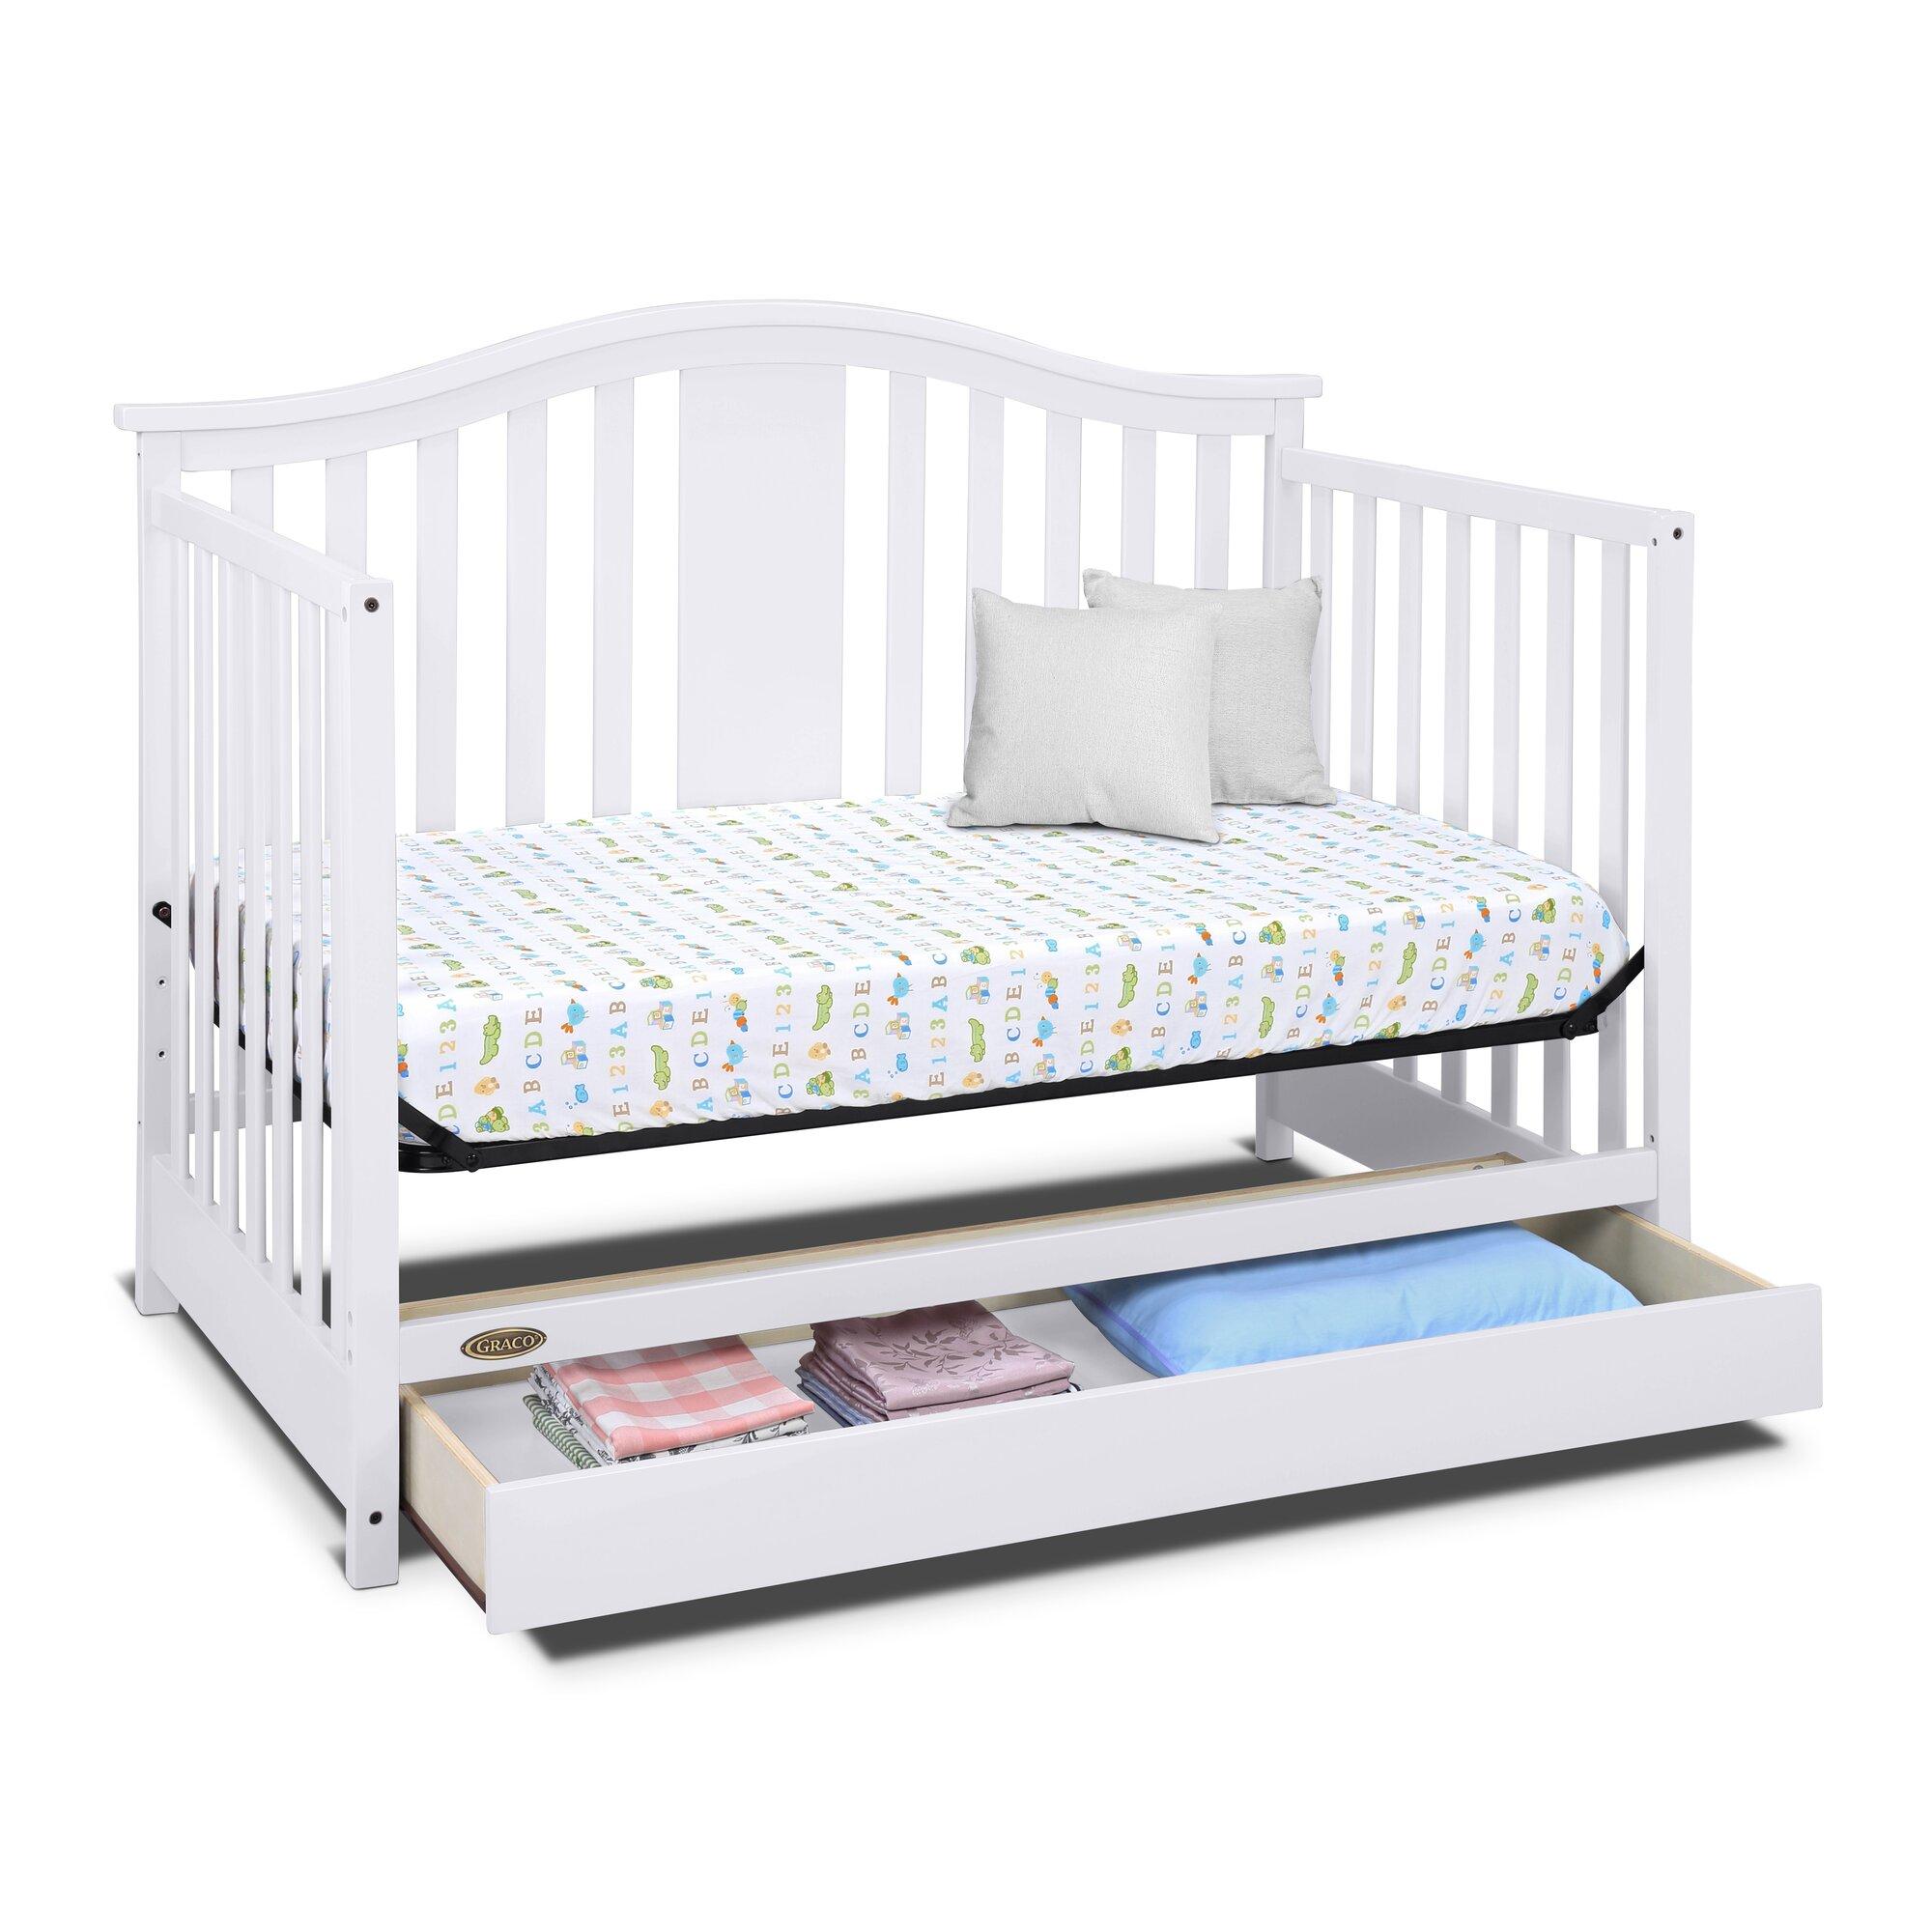 41 delta charleston crib